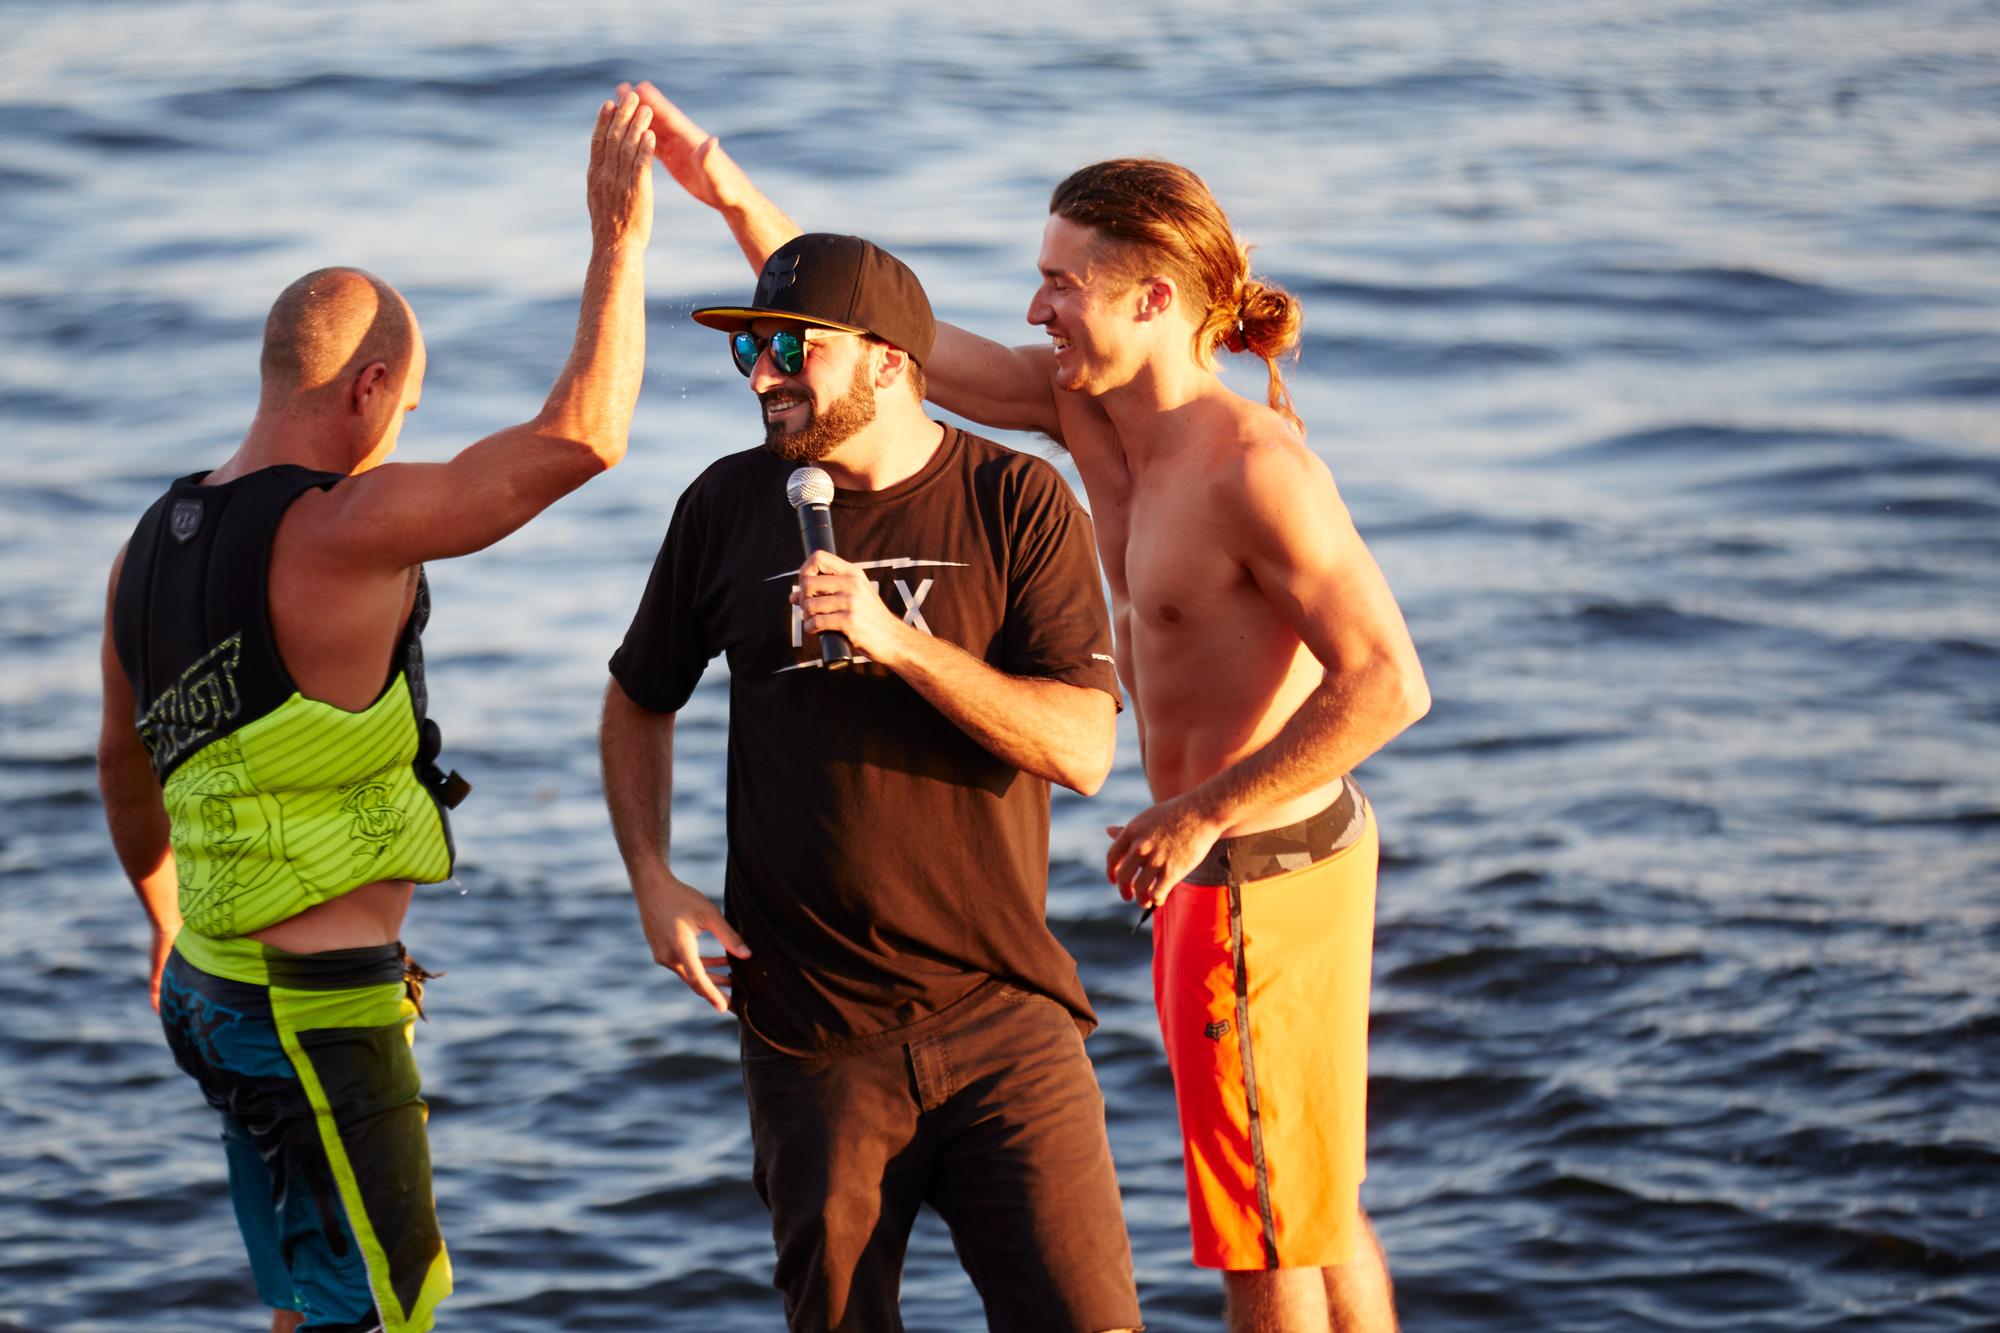 Aqua-bat_wakeboarders-minocqua-071715_284.jpg